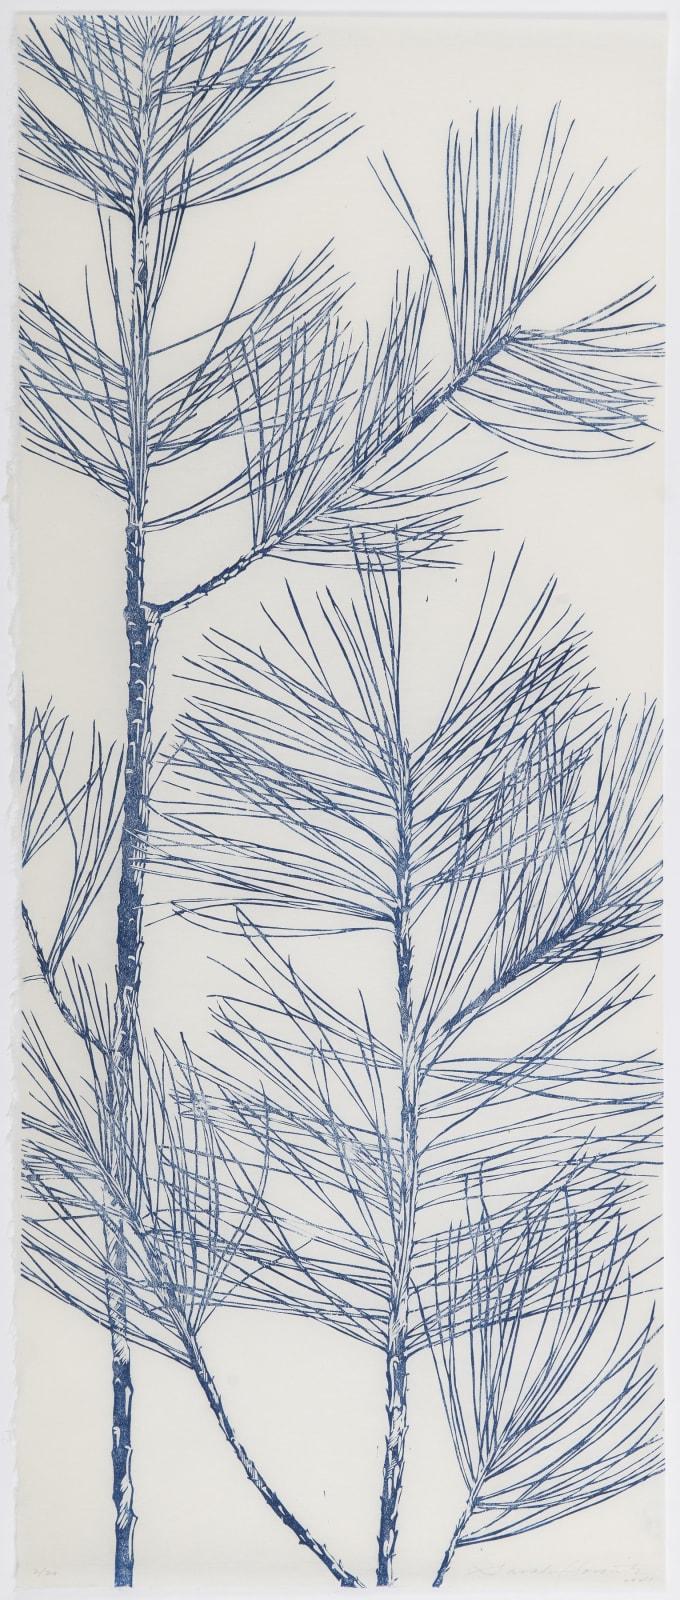 Sarah Horowitz, Blue Pines II, 2021